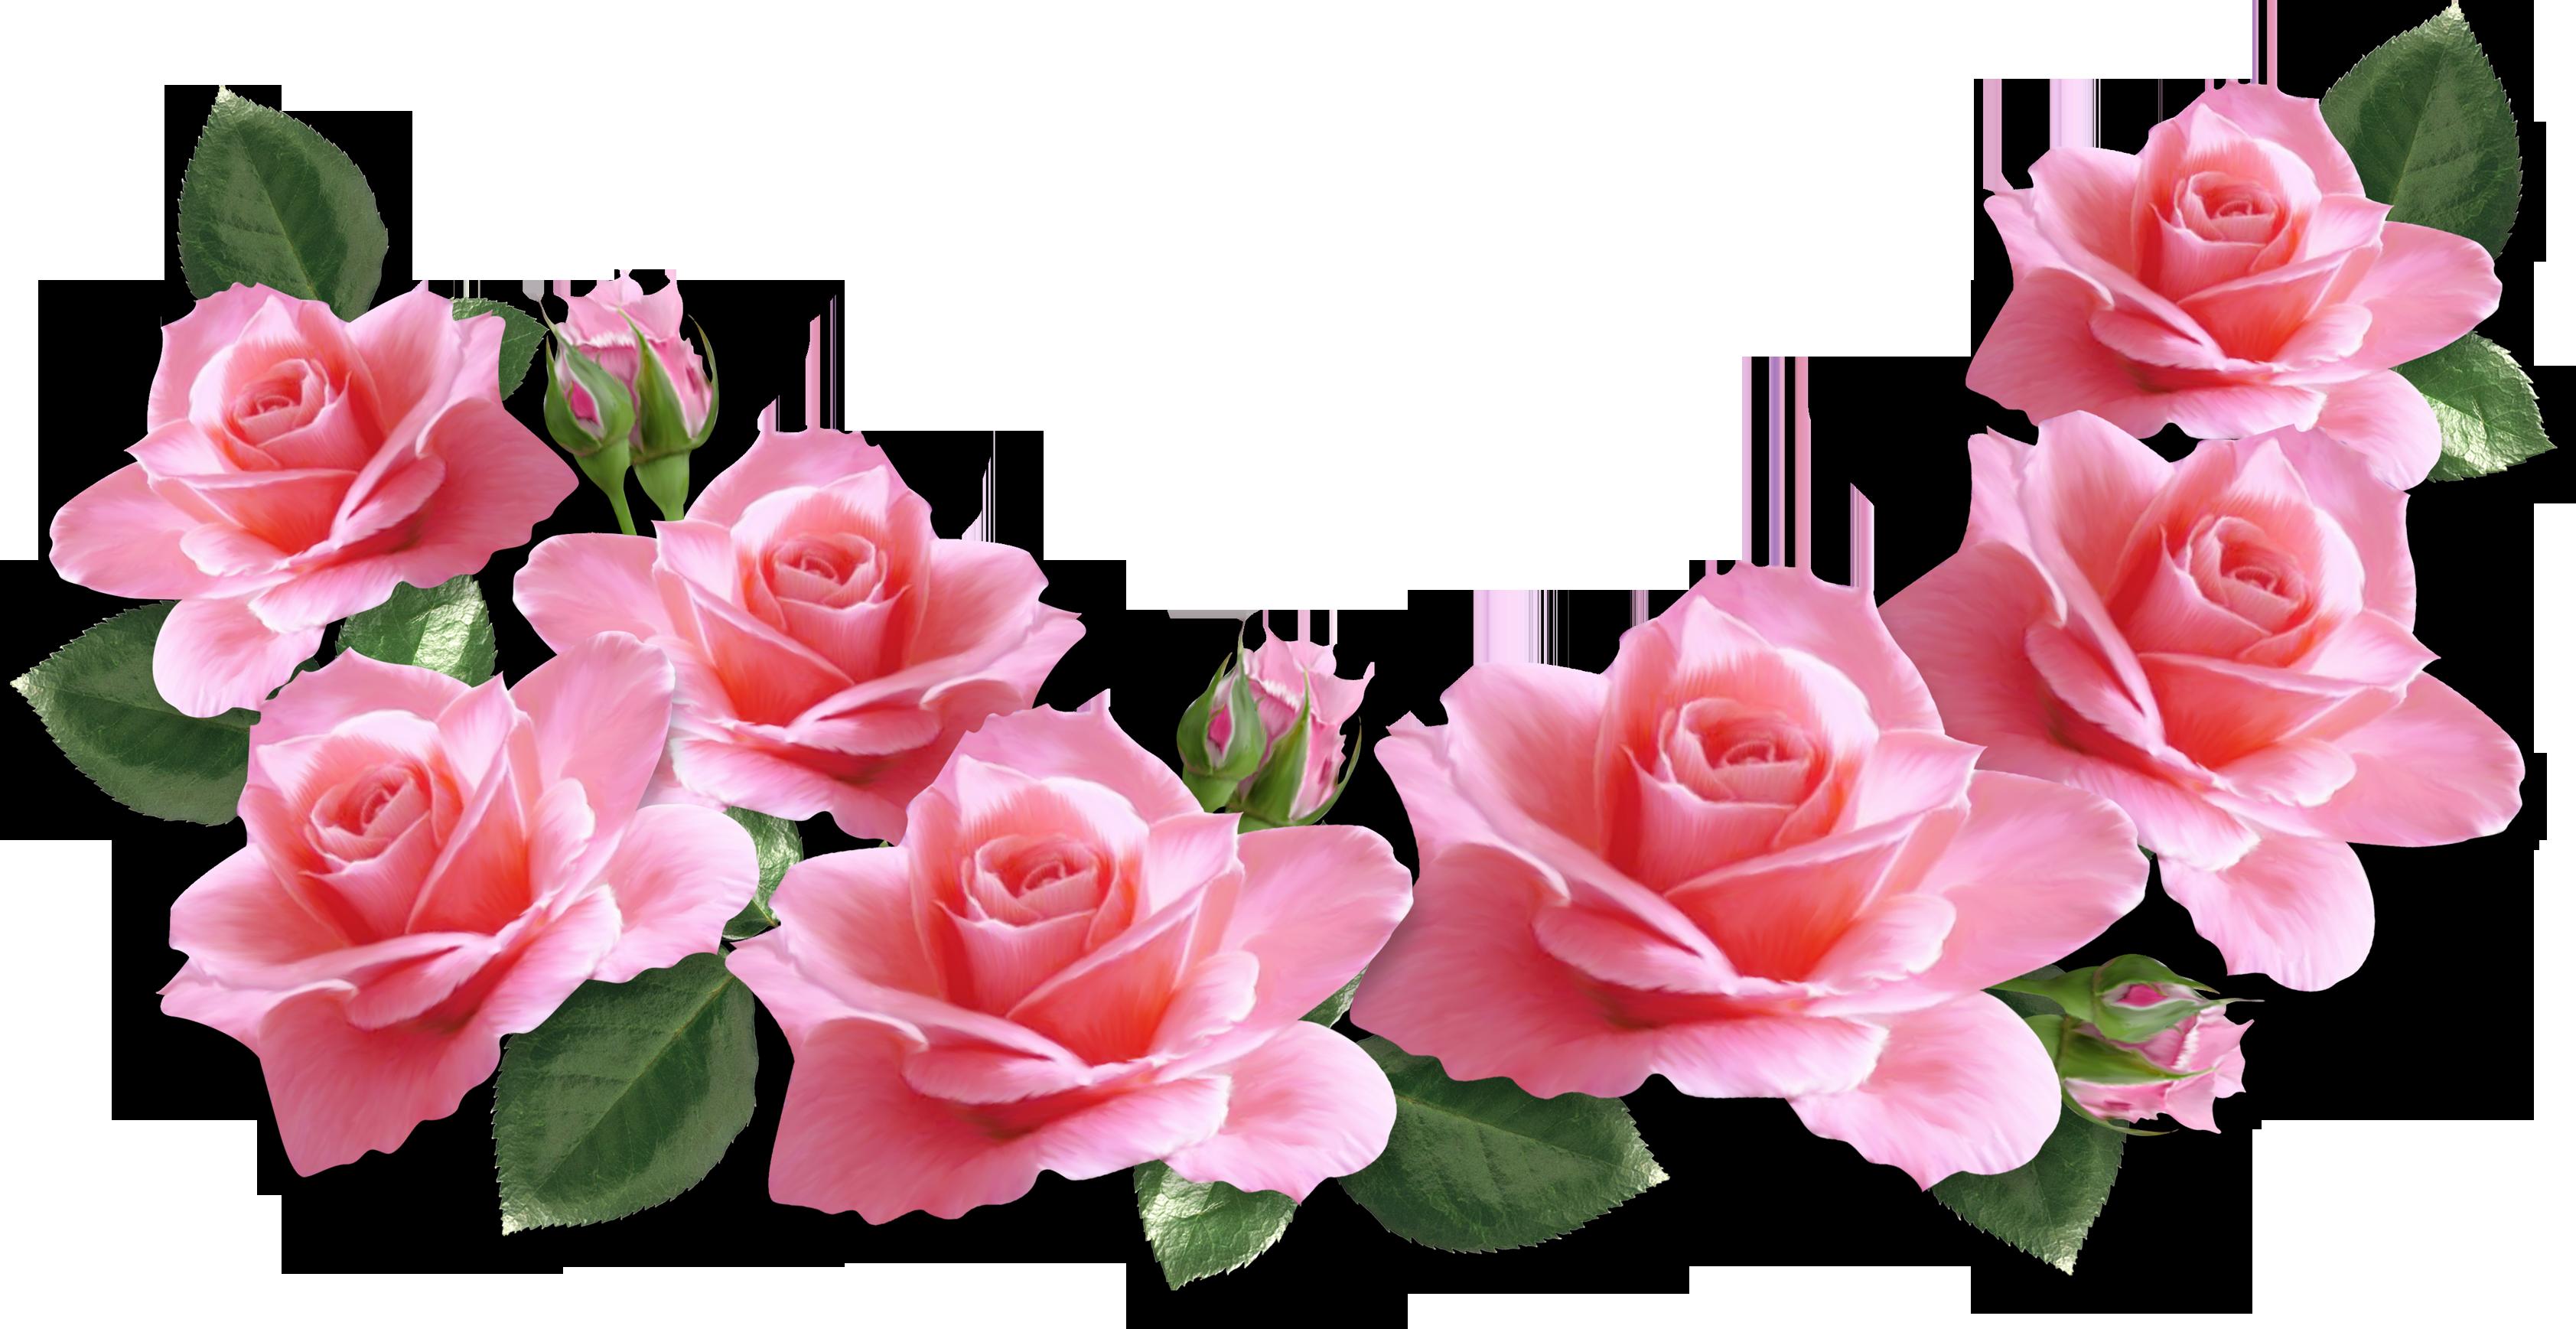 Rose clipart pink rose #15